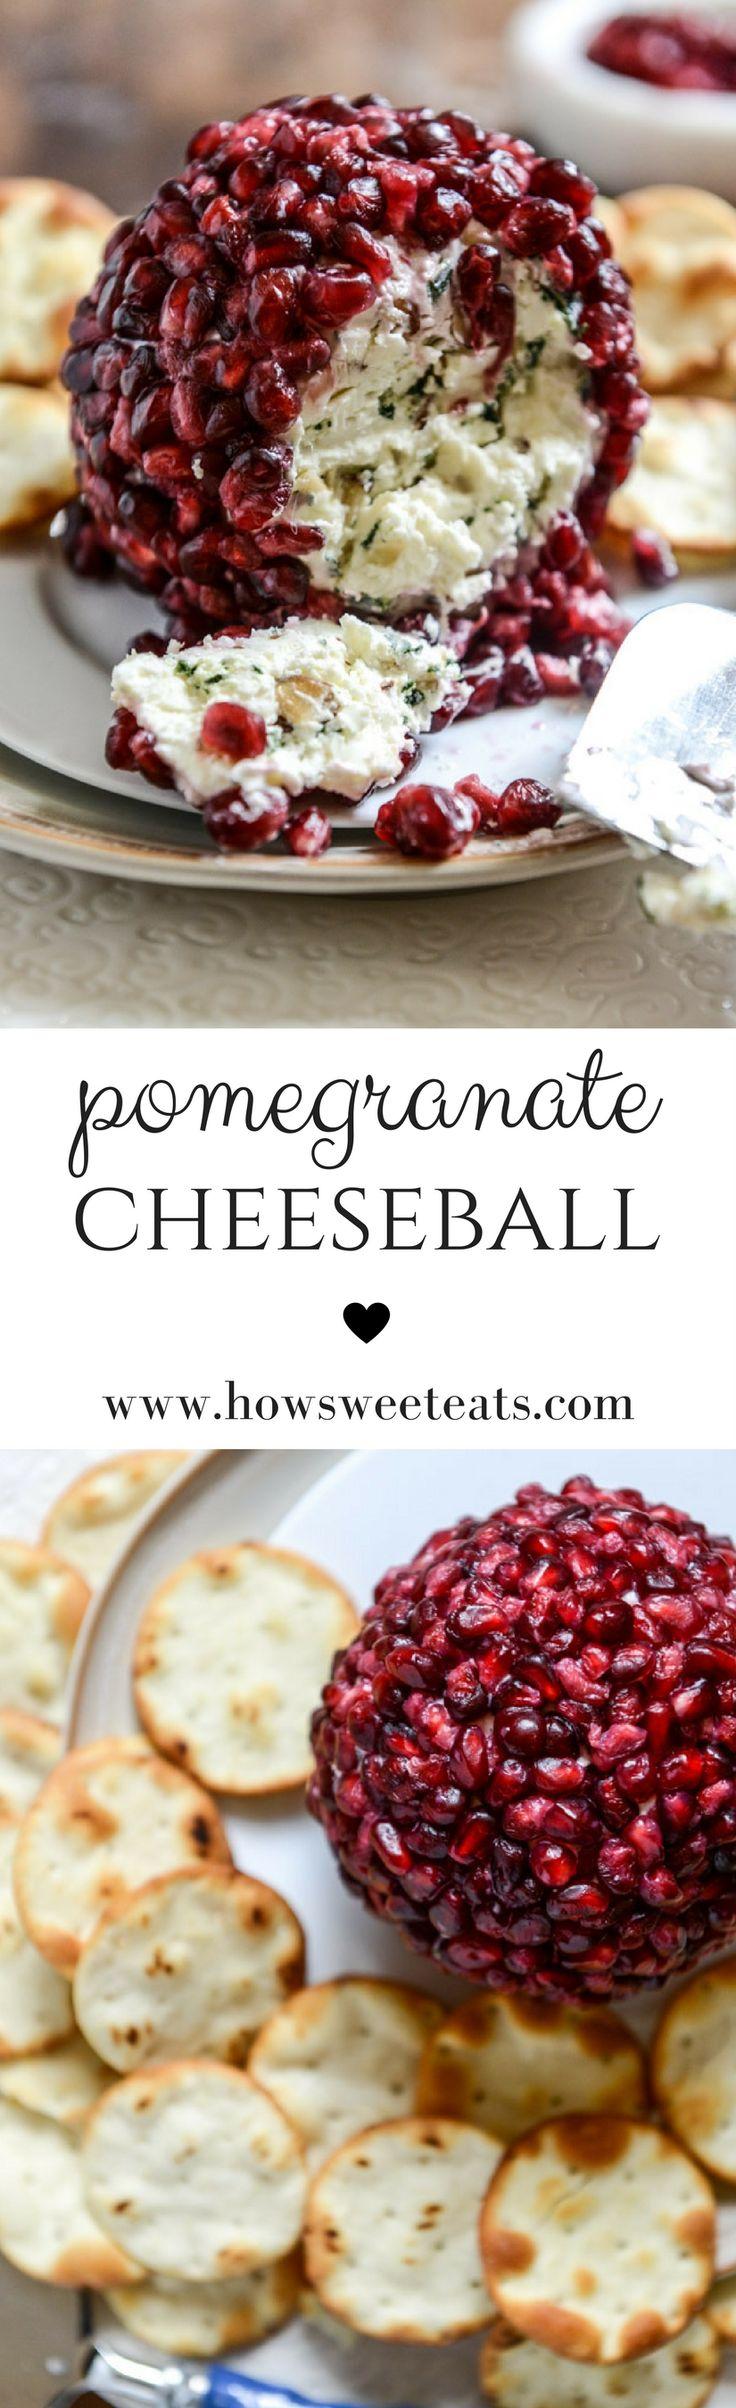 Pomegranate Jeweled Cheeseball I howsweeteats.com @howsweeteats #thanksgiving #appetizers